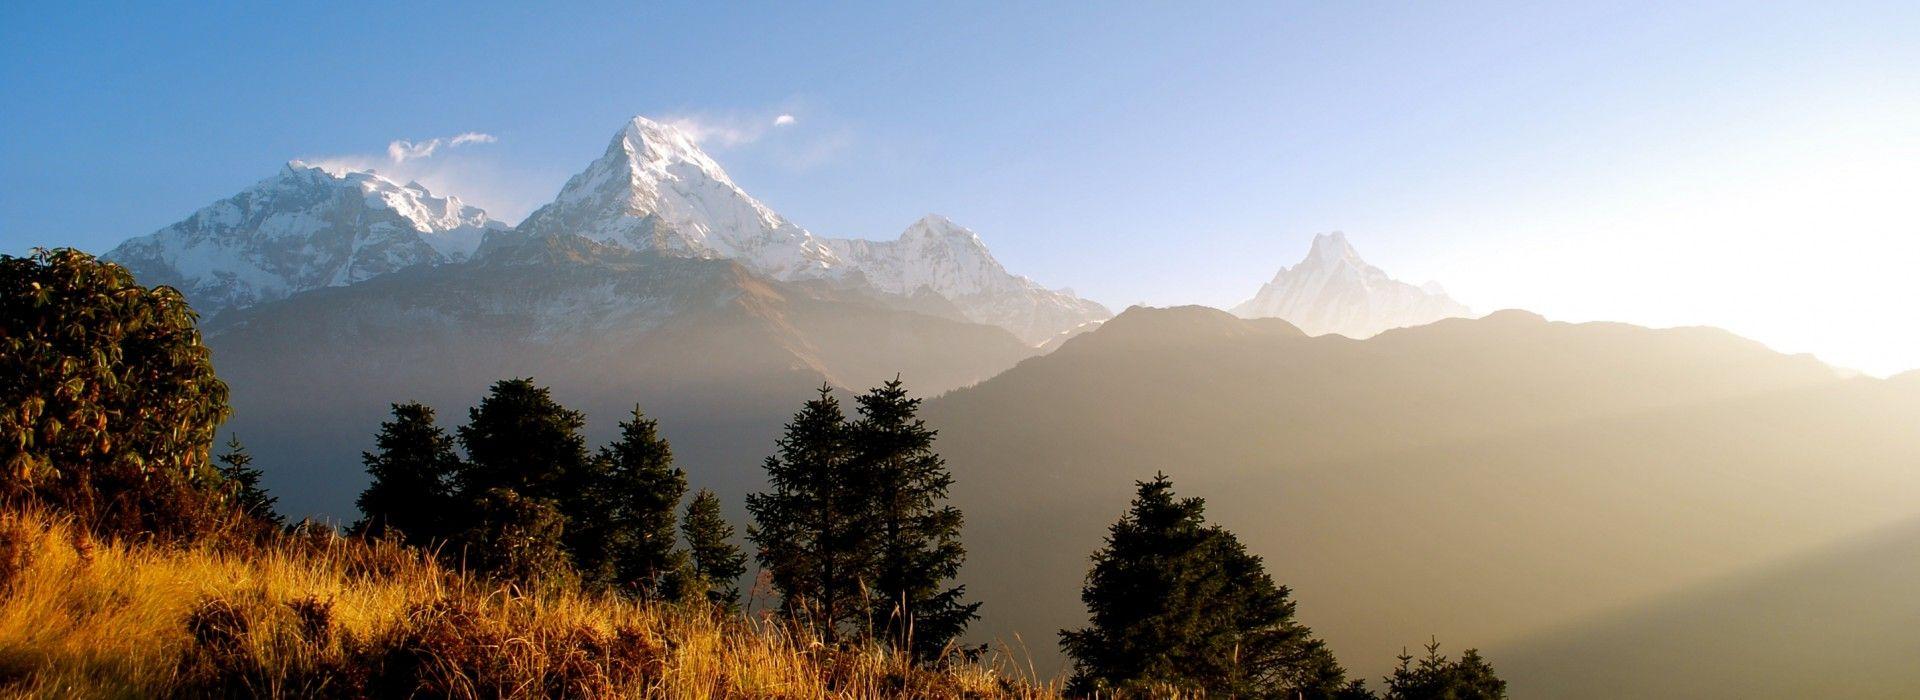 Wildlife Tours in Nepal